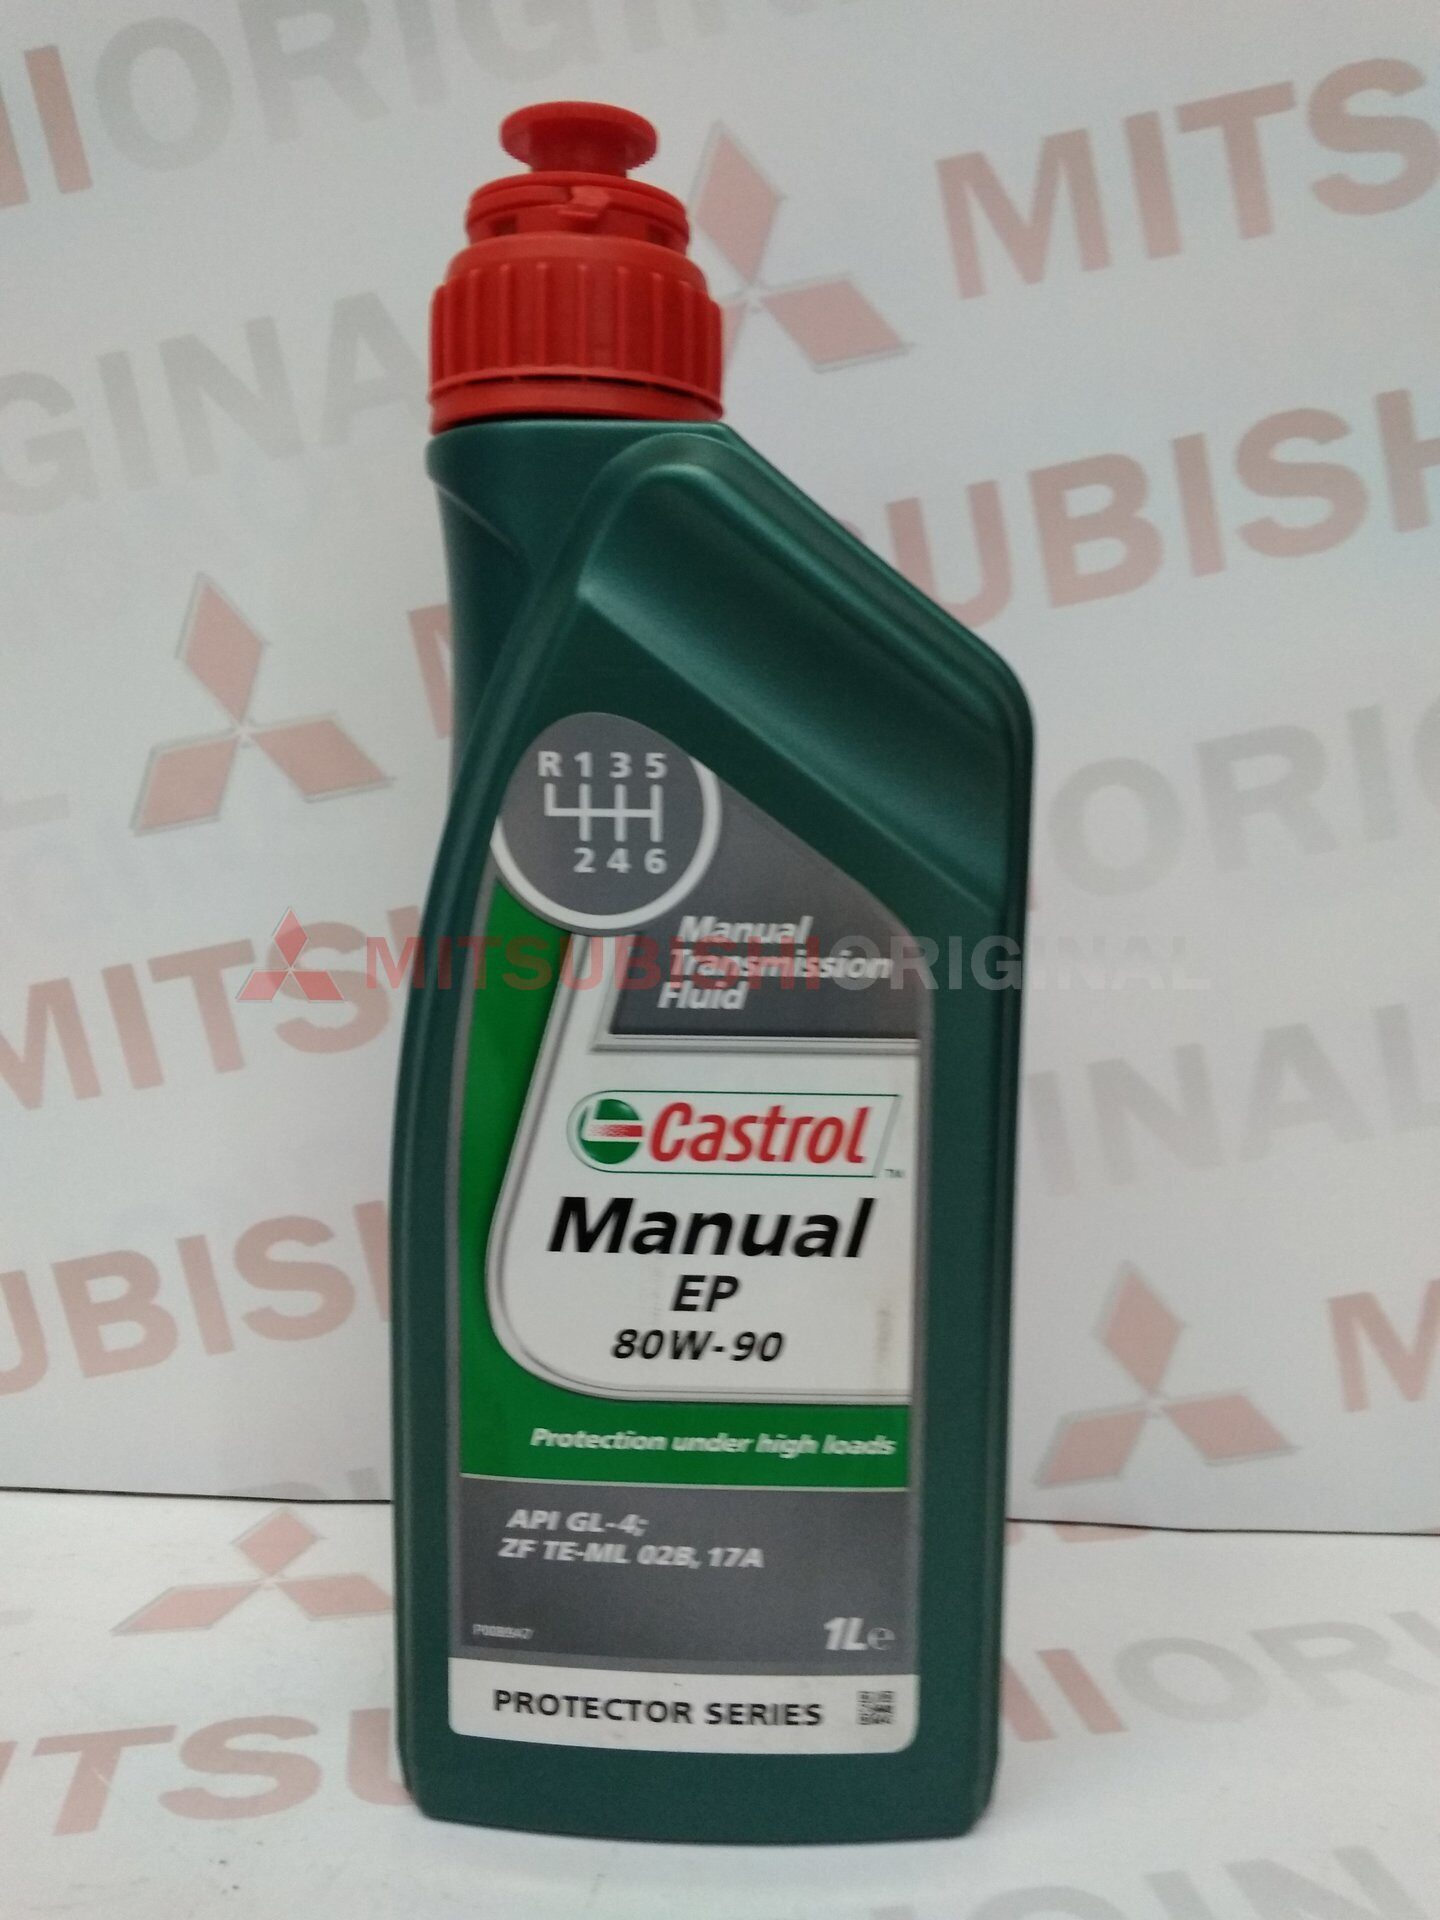 CASTROL MANUAL 153C61 Versnellingsbakolie Inhoud: 0,5L, 80W-90